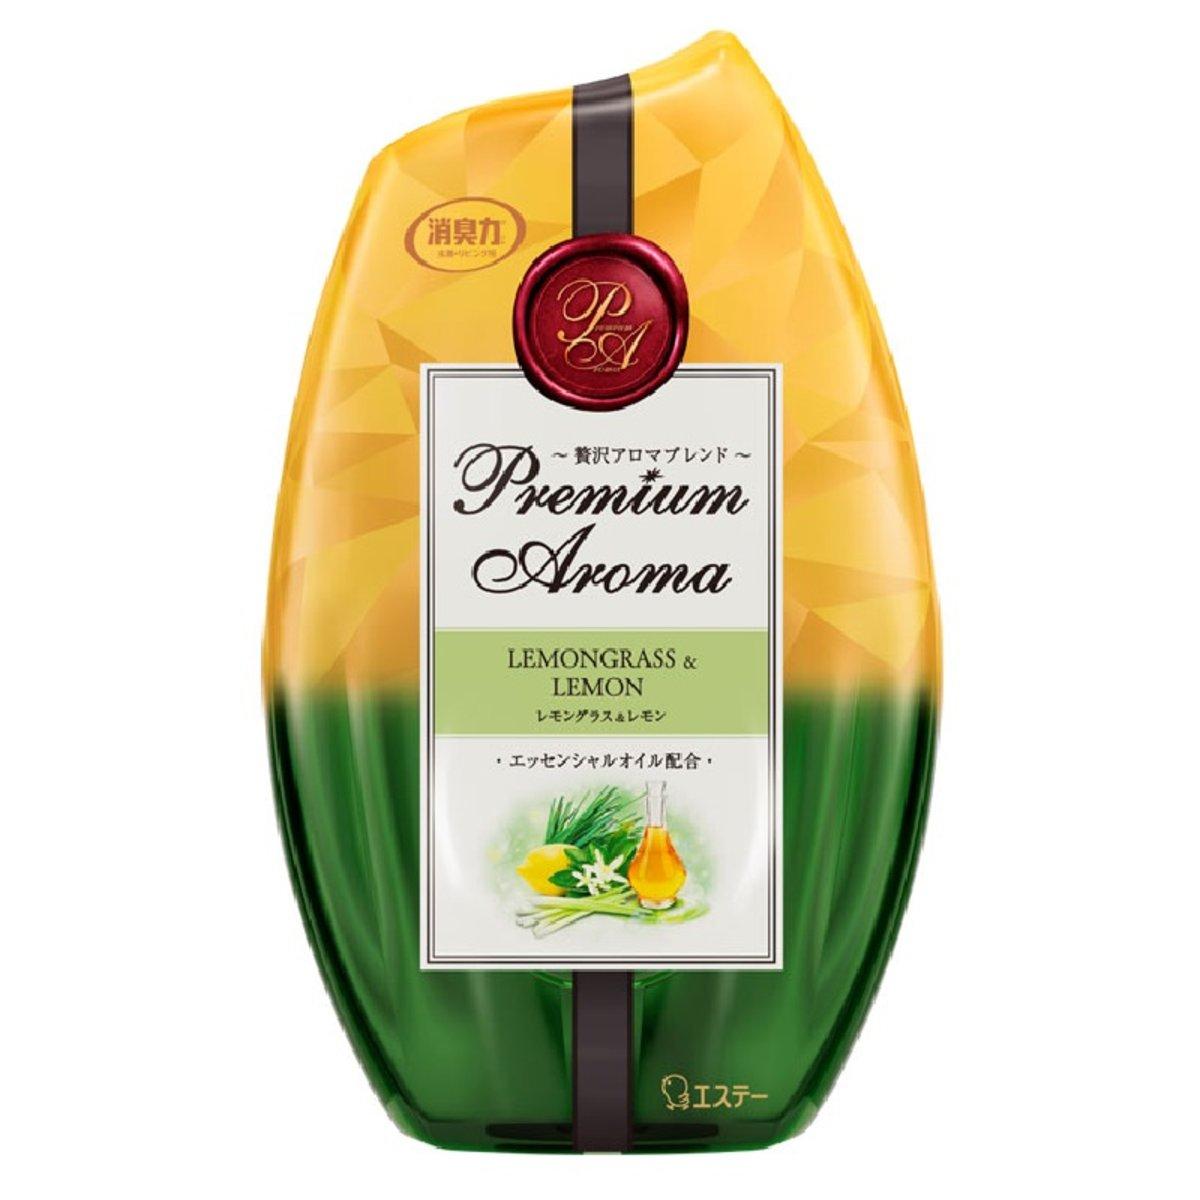 S.T. Corporation Indoor Deodorant (Yellow Green) #Lemongrass & Lemon 400ml